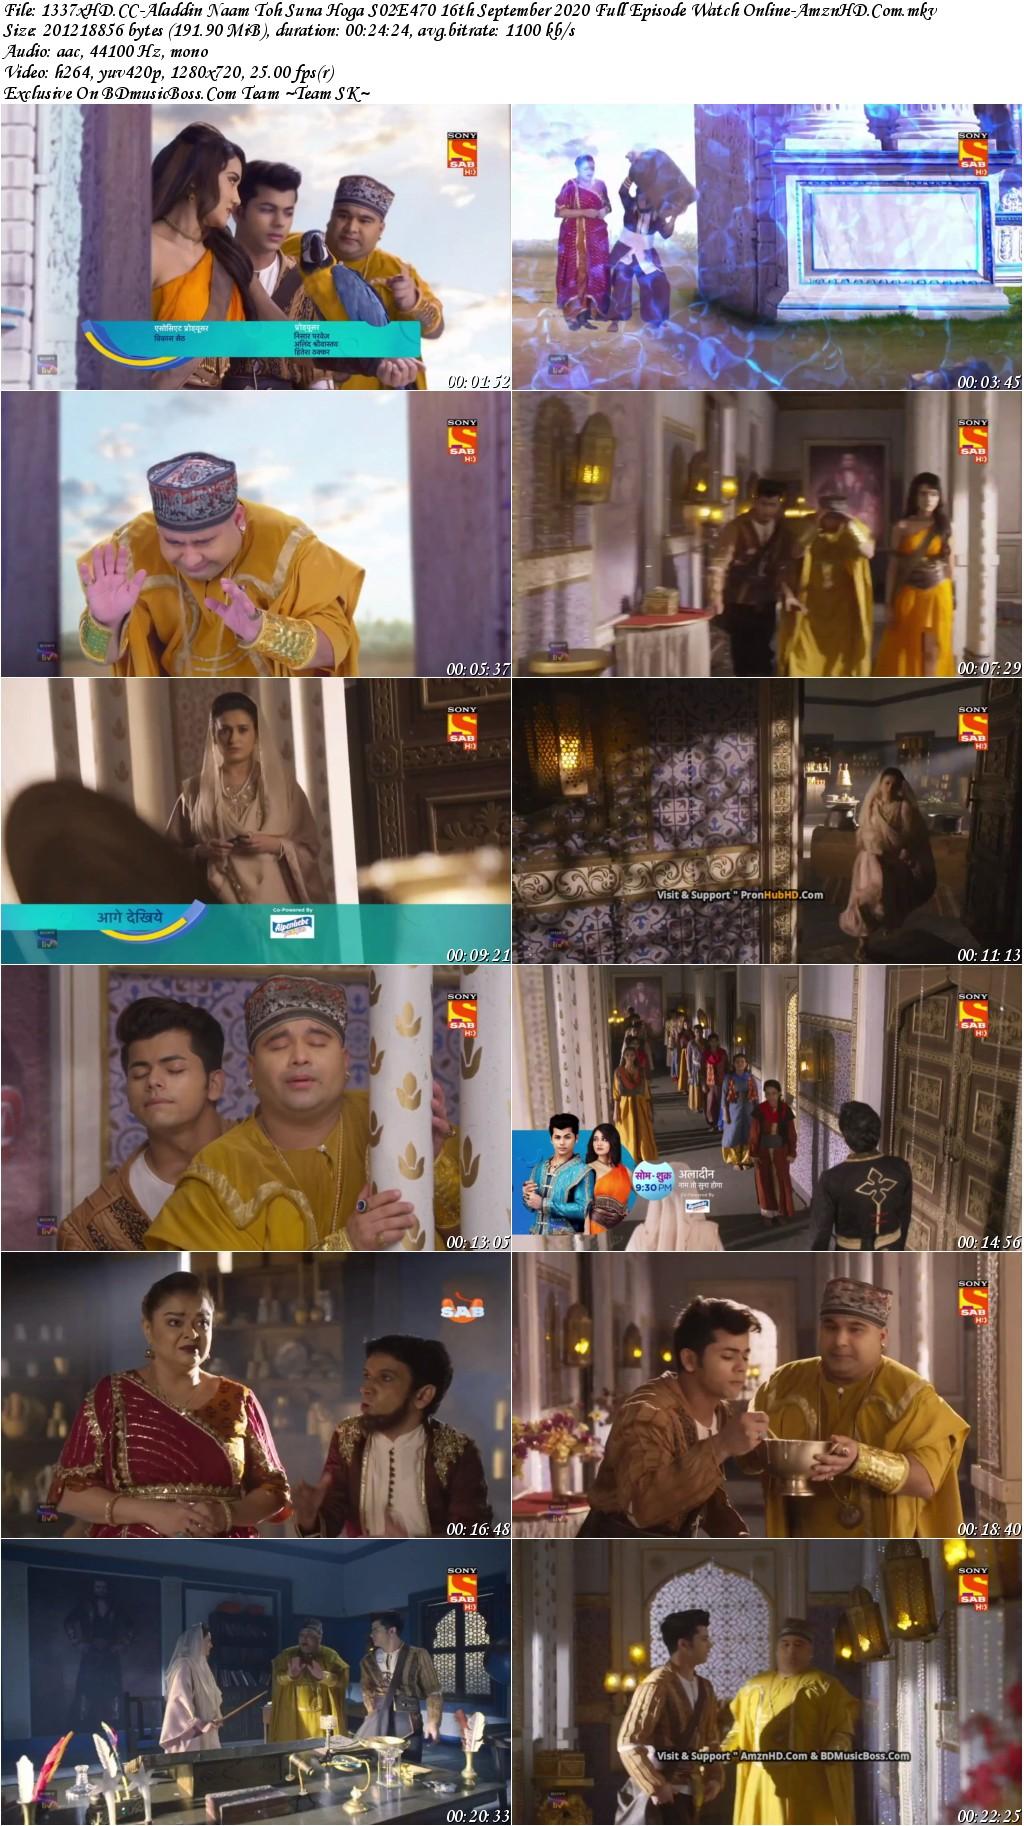 1337x-HD-CC-Aladdin-Naam-Toh-Suna-Hoga-S02-E470-16th-September-2020-Full-Episode-Watch-Online-Amzn-H